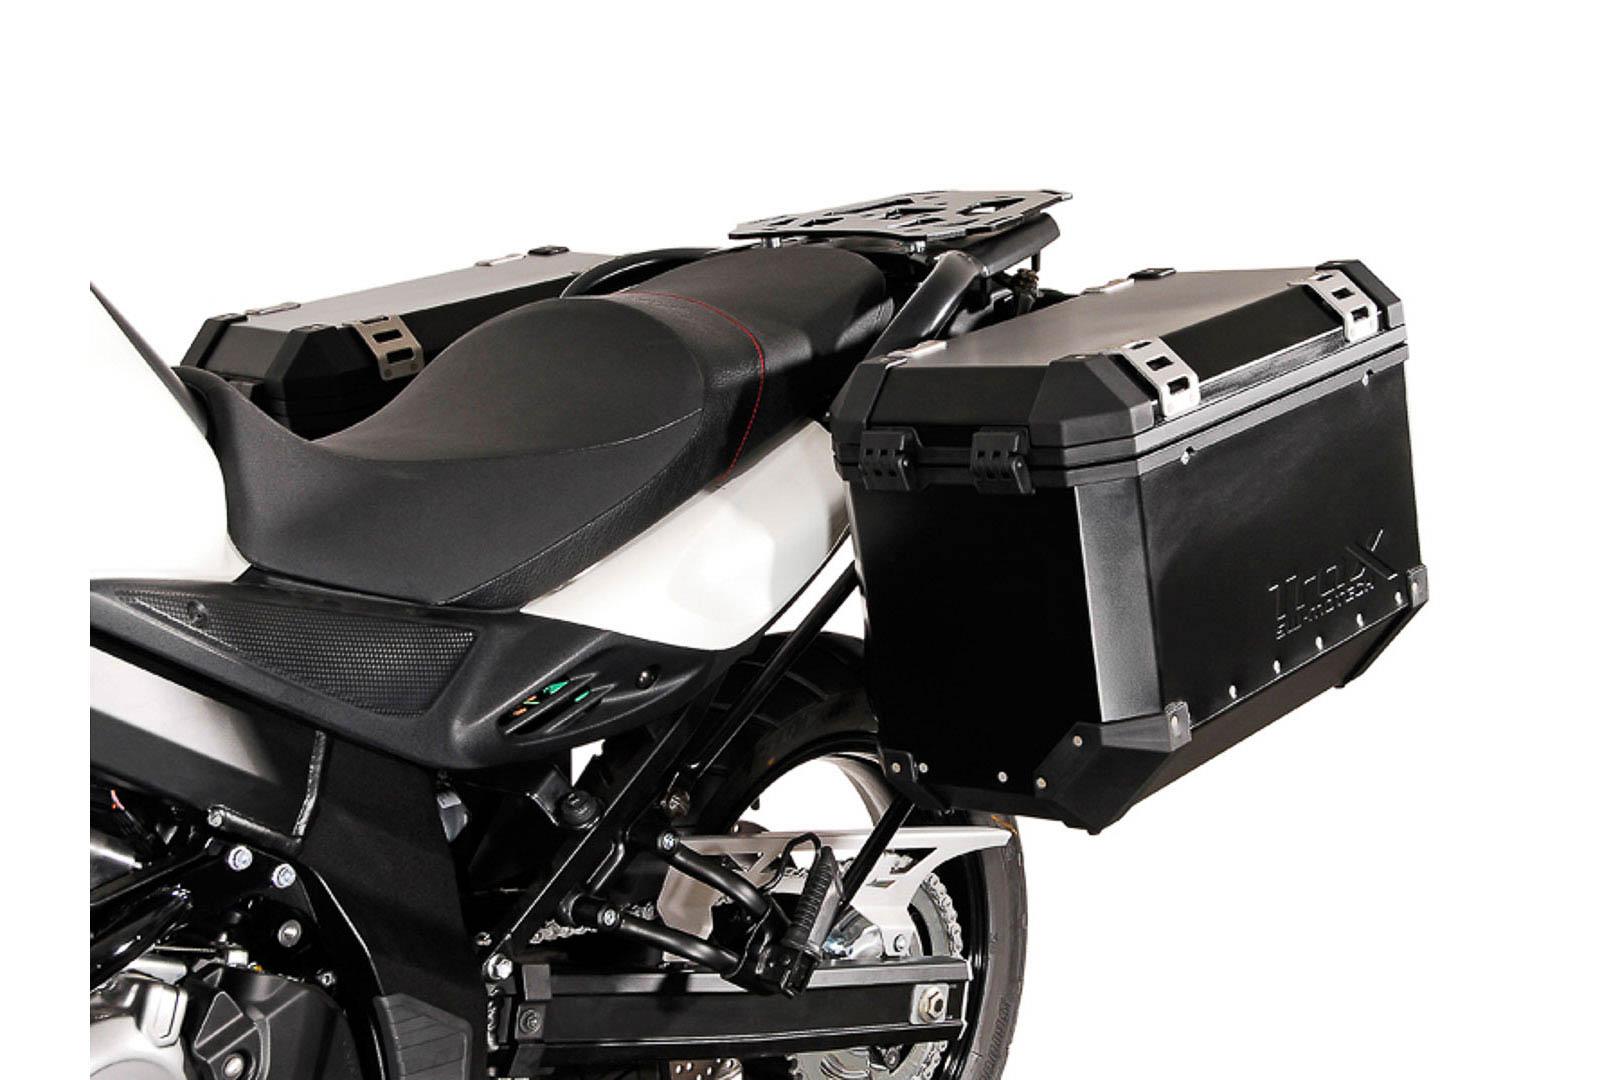 SW-Motech Quick-Lock Evo sivutelinesarja Suzuki DL650 V-Strom 11-